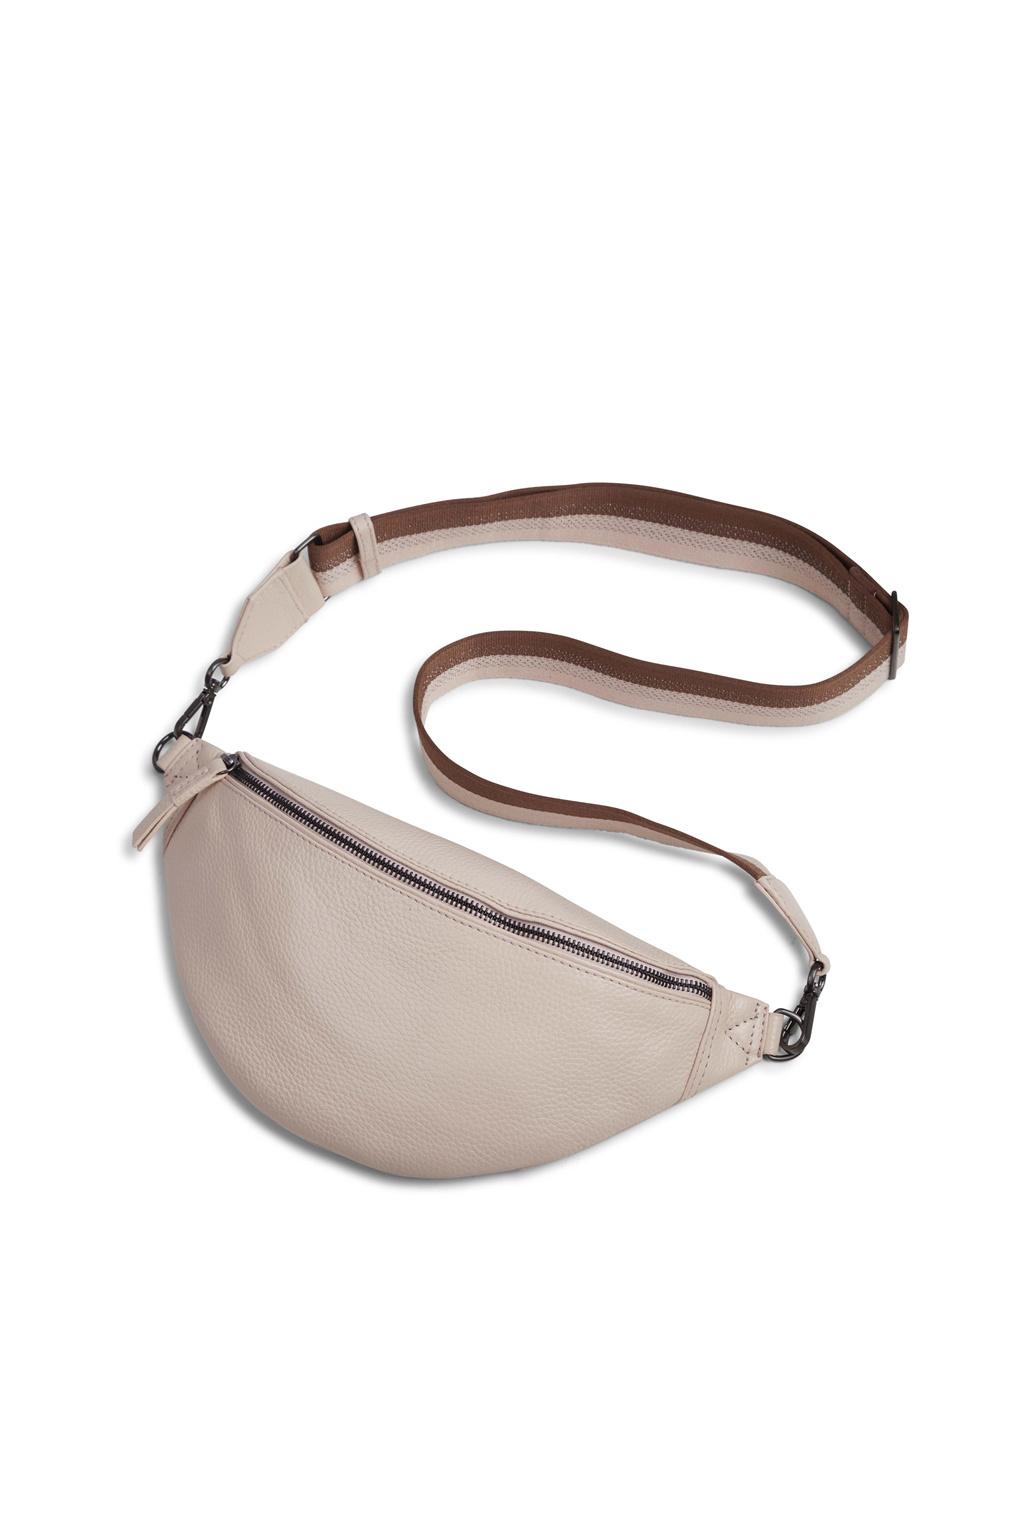 Elinor Bum Bag - Grain Blush w/ Blush + Taupe-1